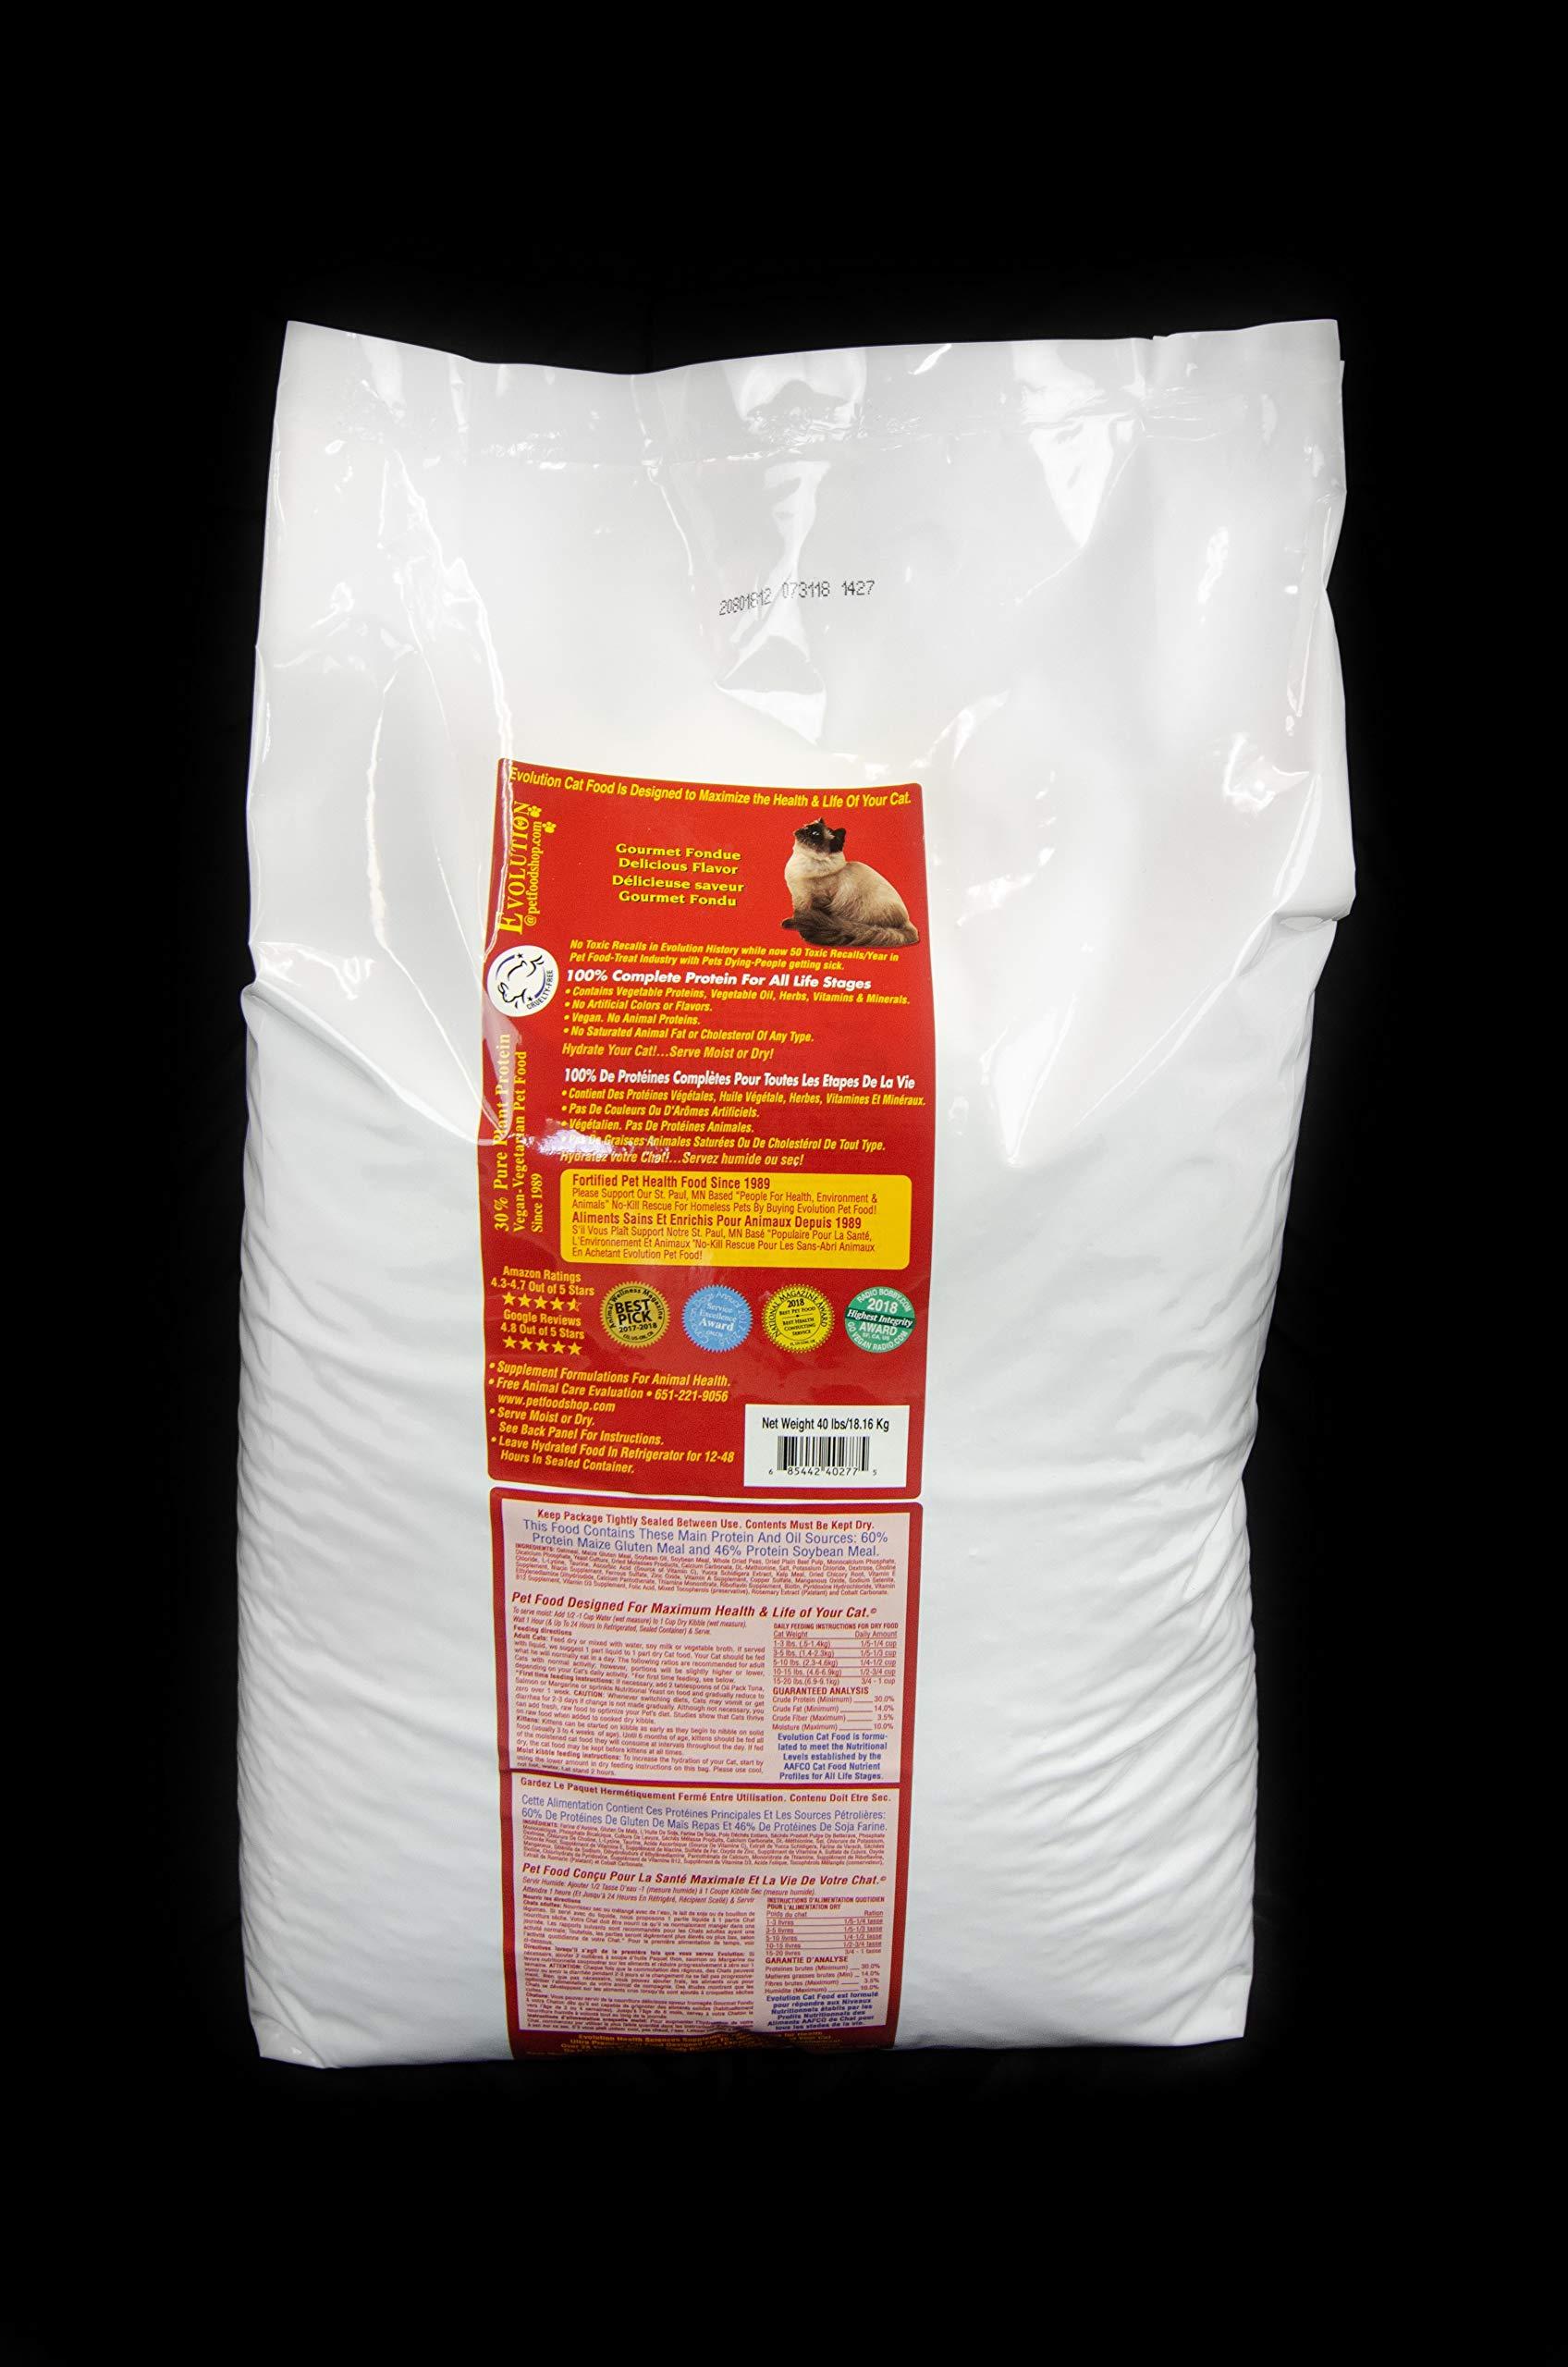 Evolution Diet Gourmet Fondue Cat Food 40 lb Bag by Evolution Diet